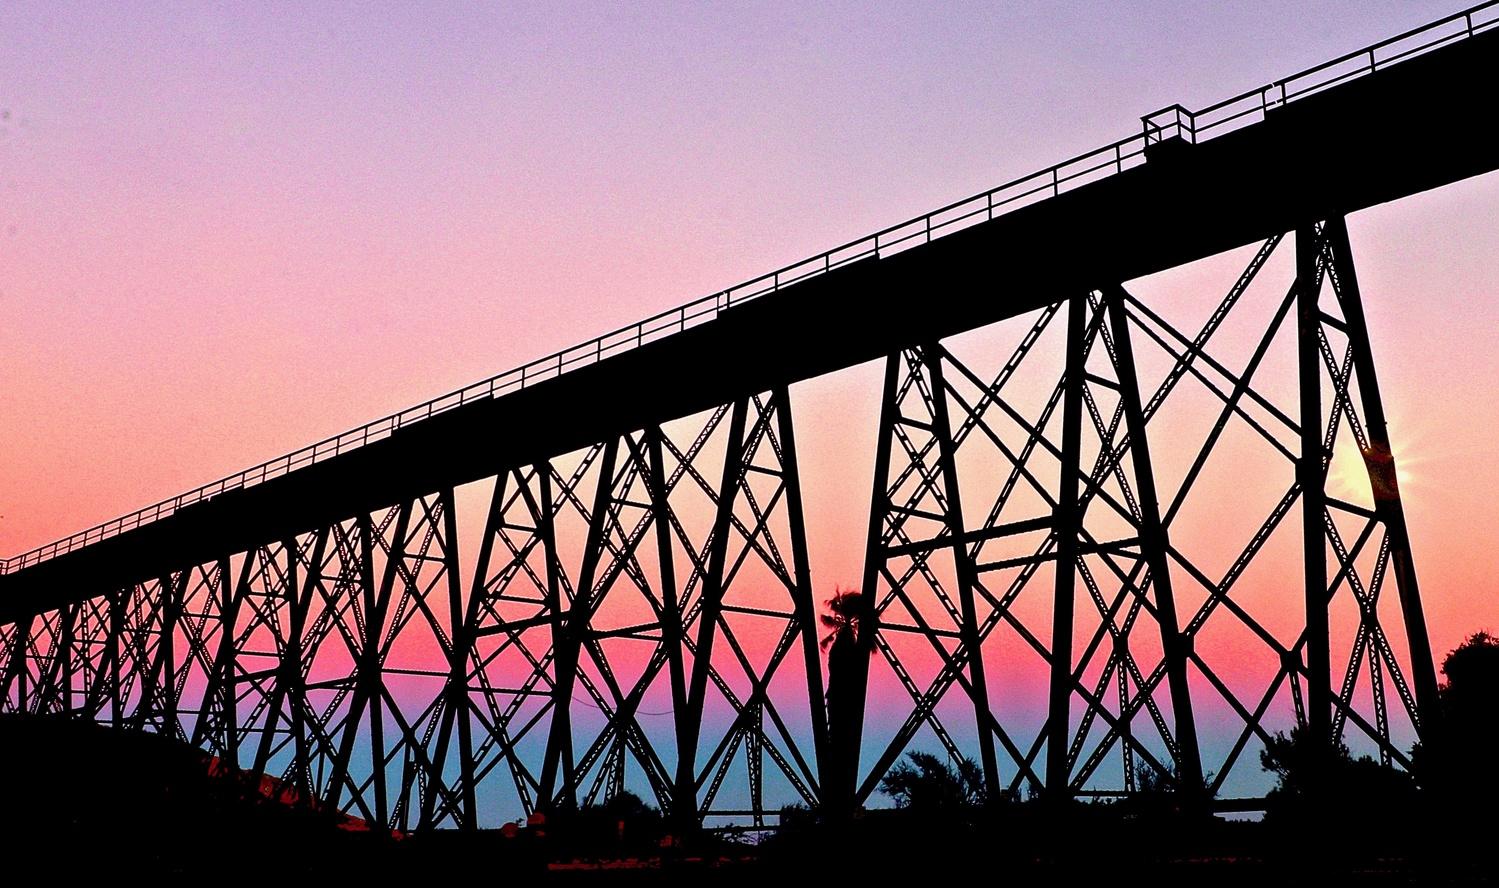 Trestle Sunset by Garrett Camp